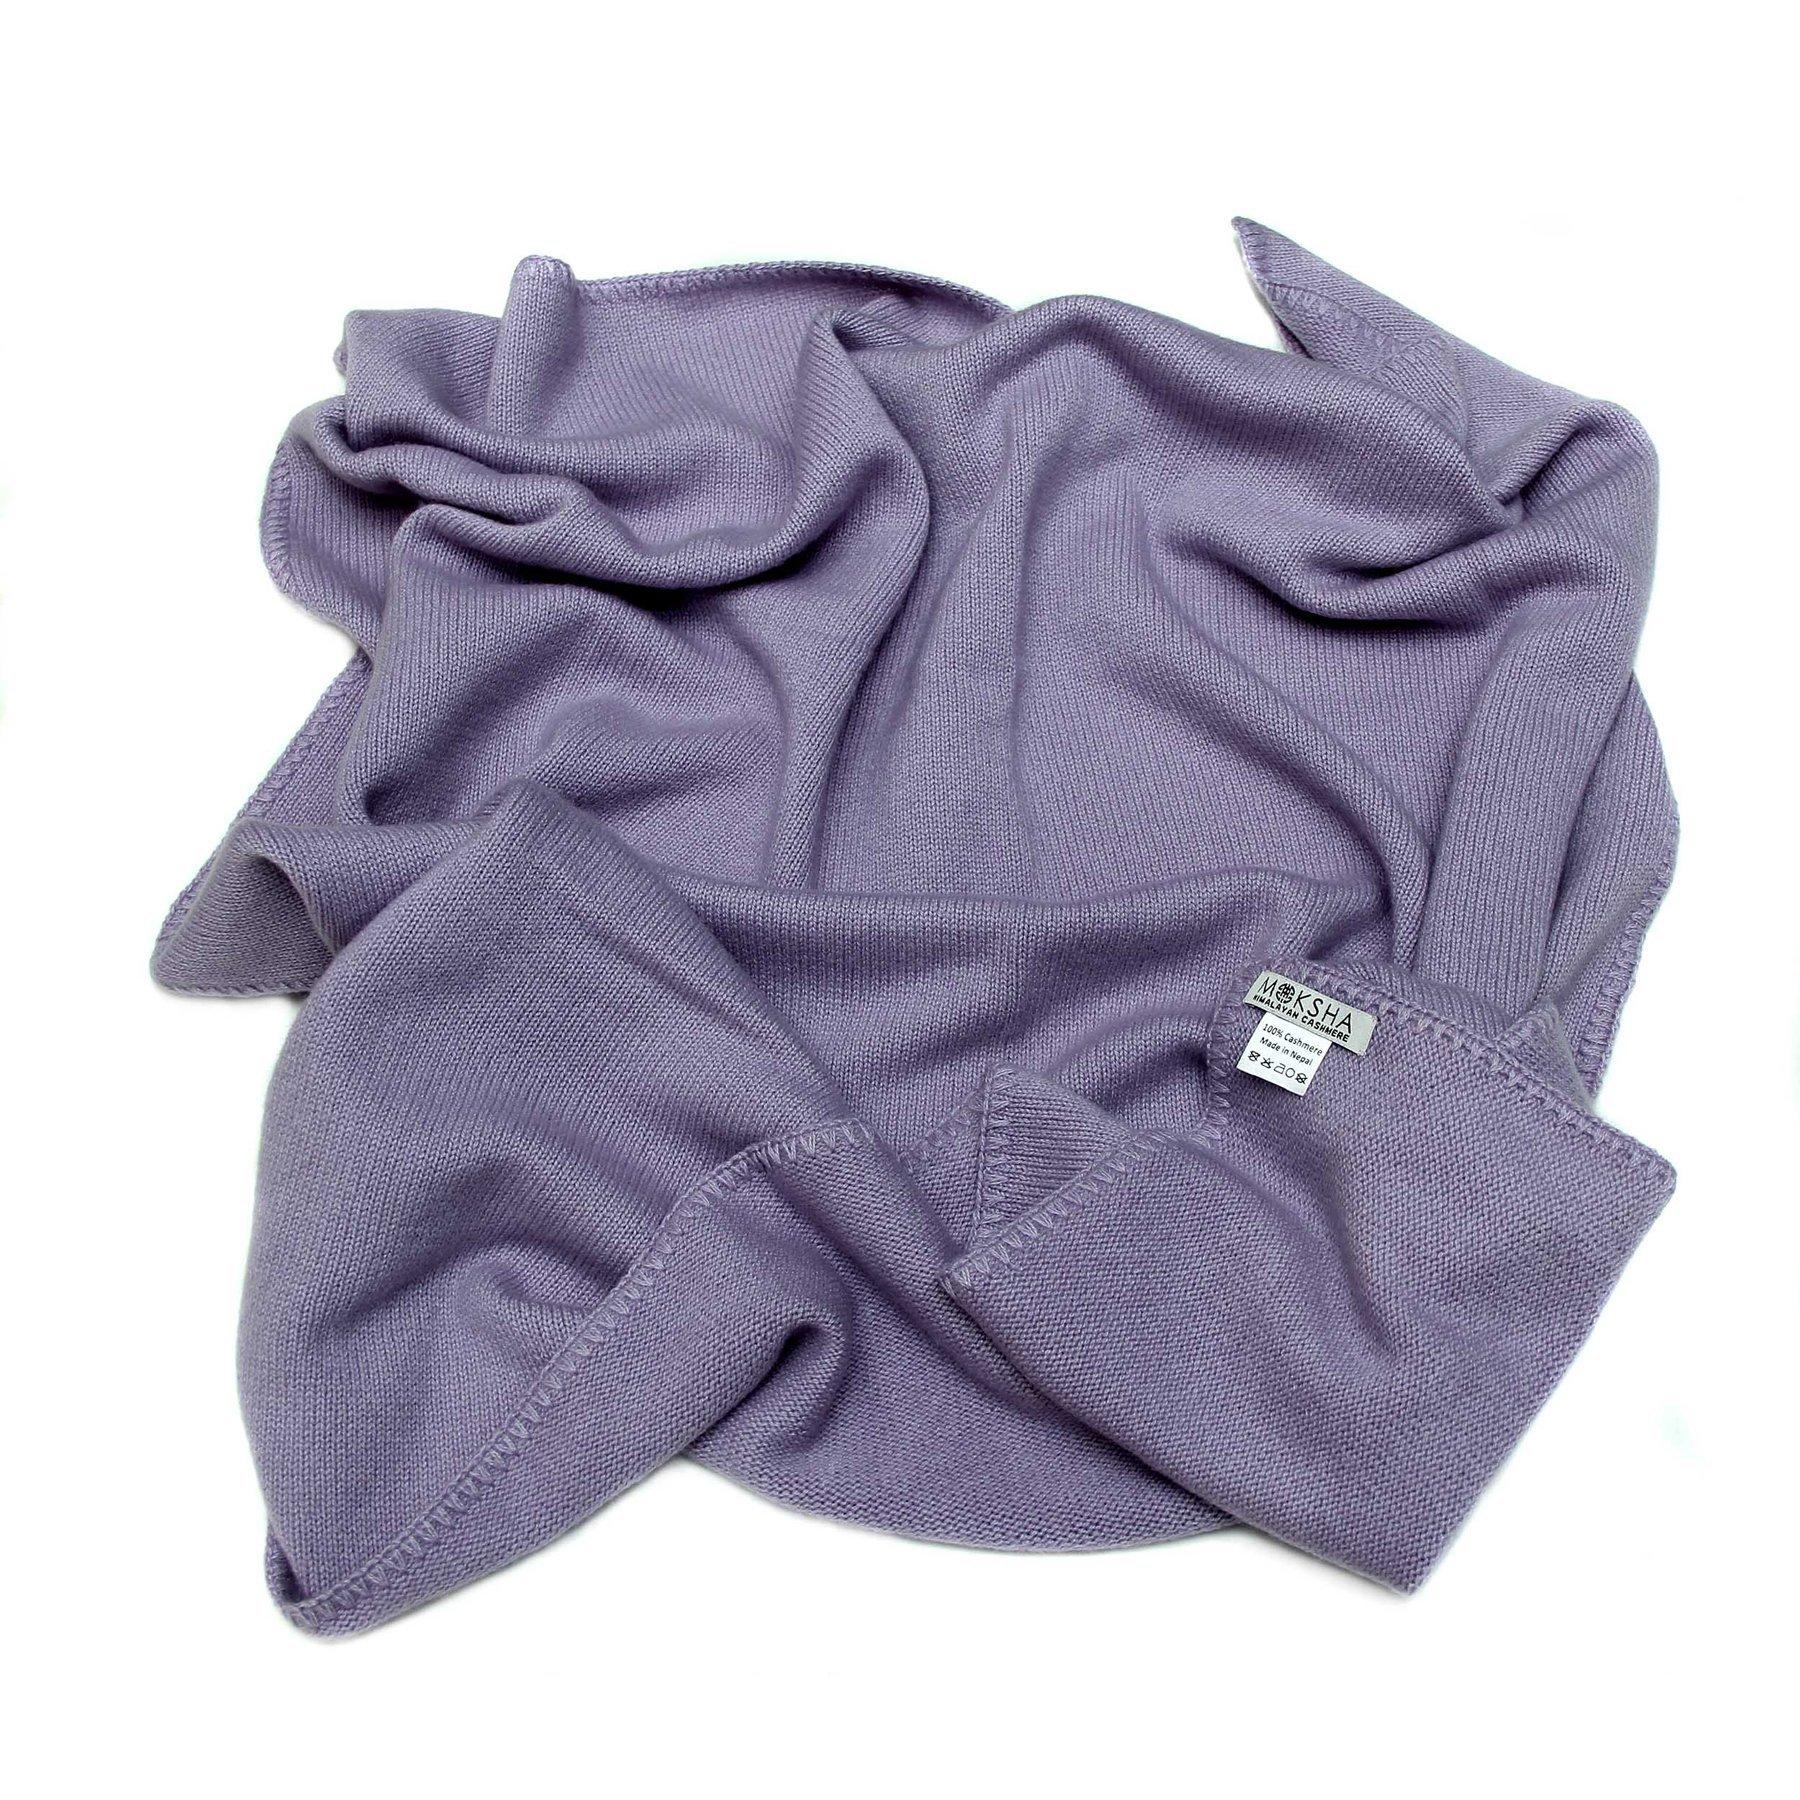 100% Cashmere Baby Blanket, 4 Ply Mongolian 26/2 Yarn Cashmere, Hand-Knitte, Purple © Moksha Cashmere